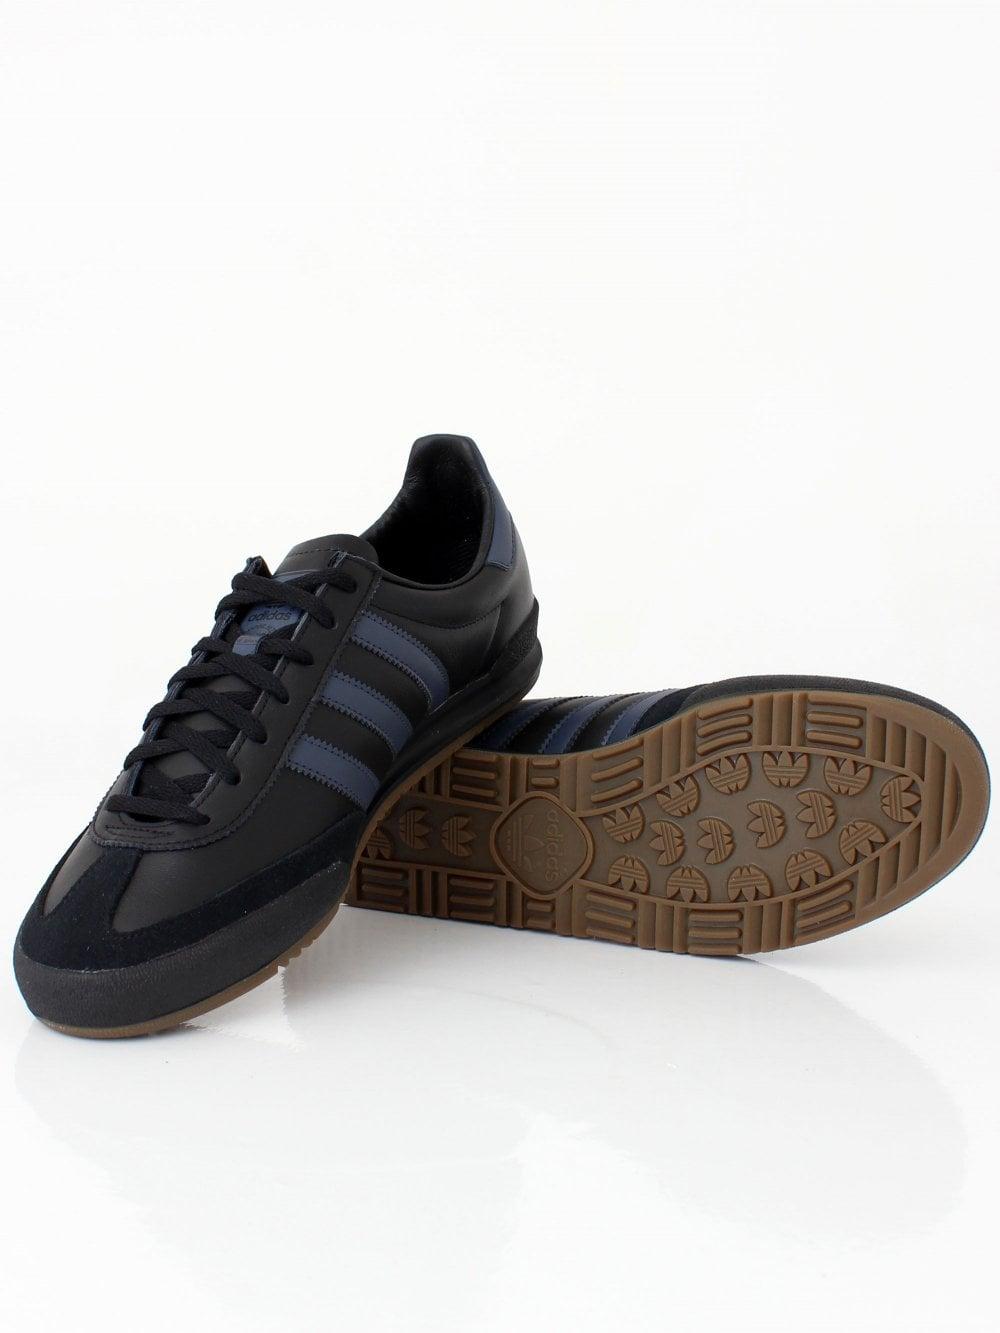 adidas jeans black